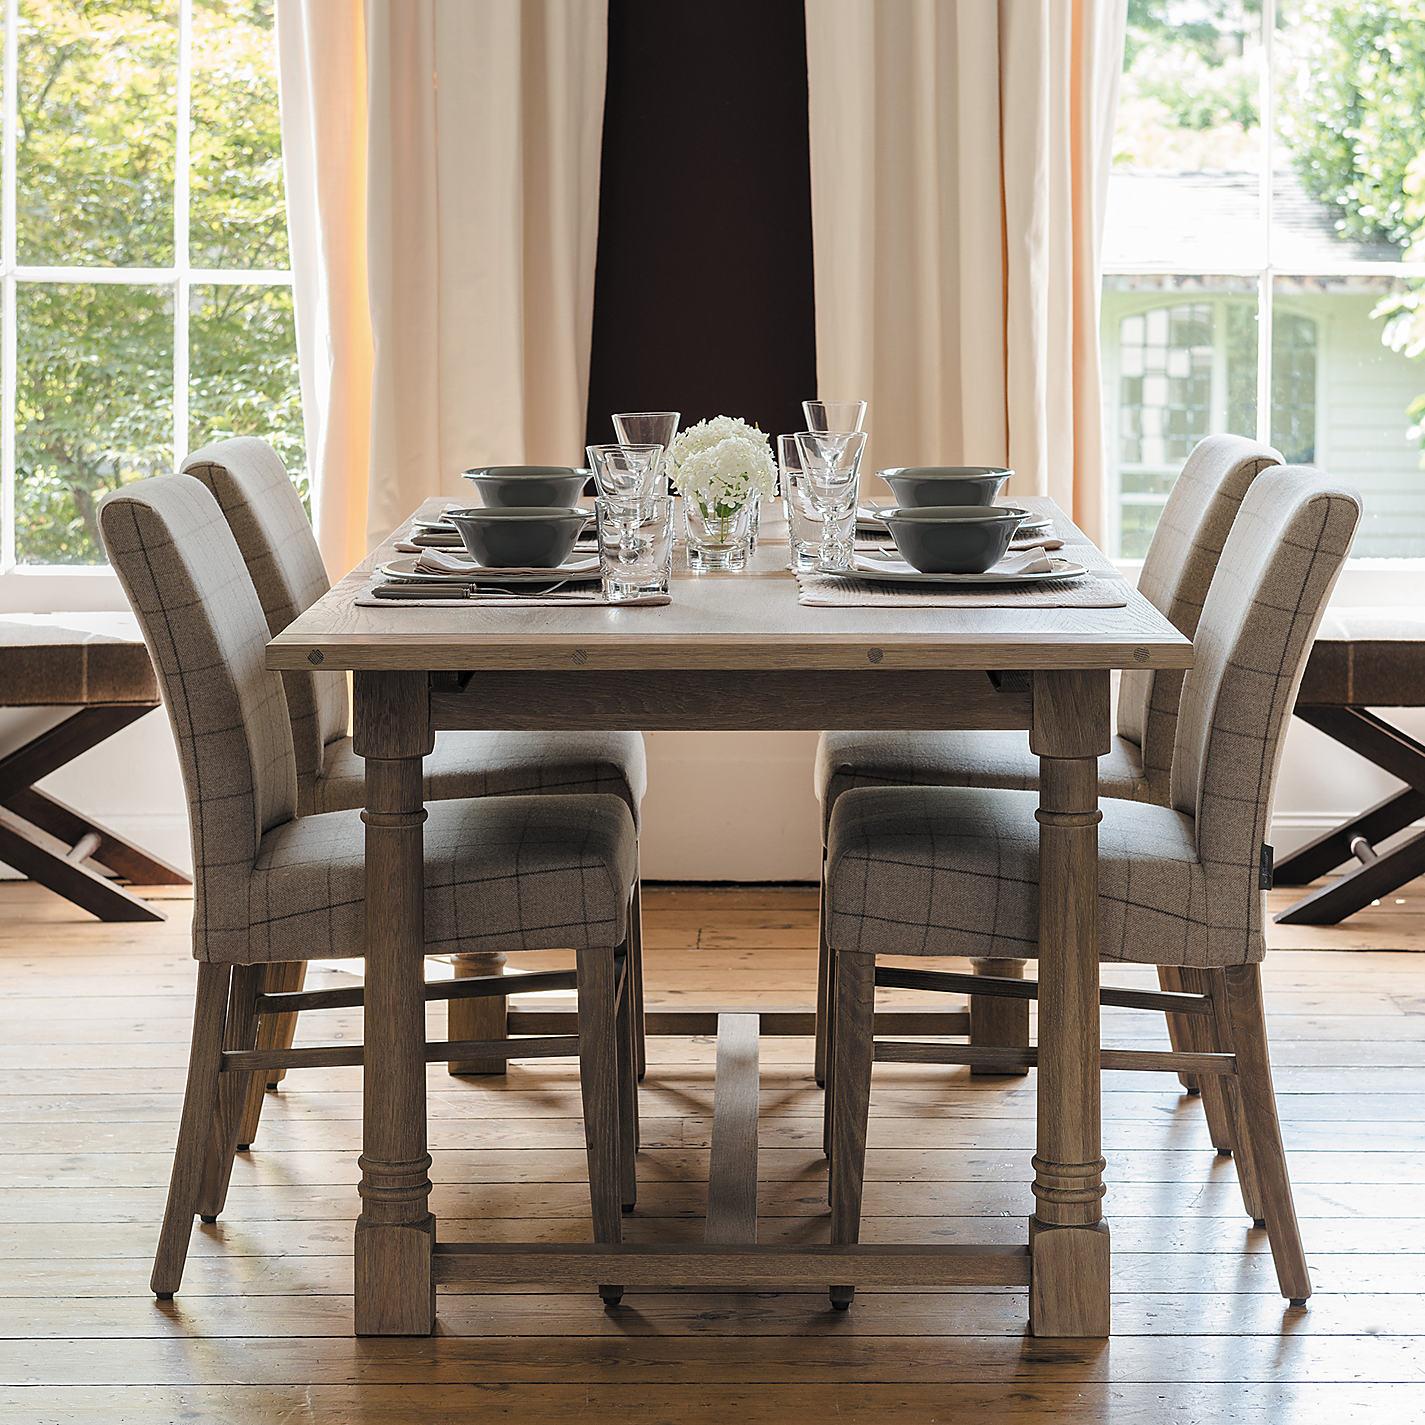 Surprising John Lewis Dining Room Tables Photos Best  : 234299054alt2prodexlrg from eumolp.us size 1425 x 1425 jpeg 376kB